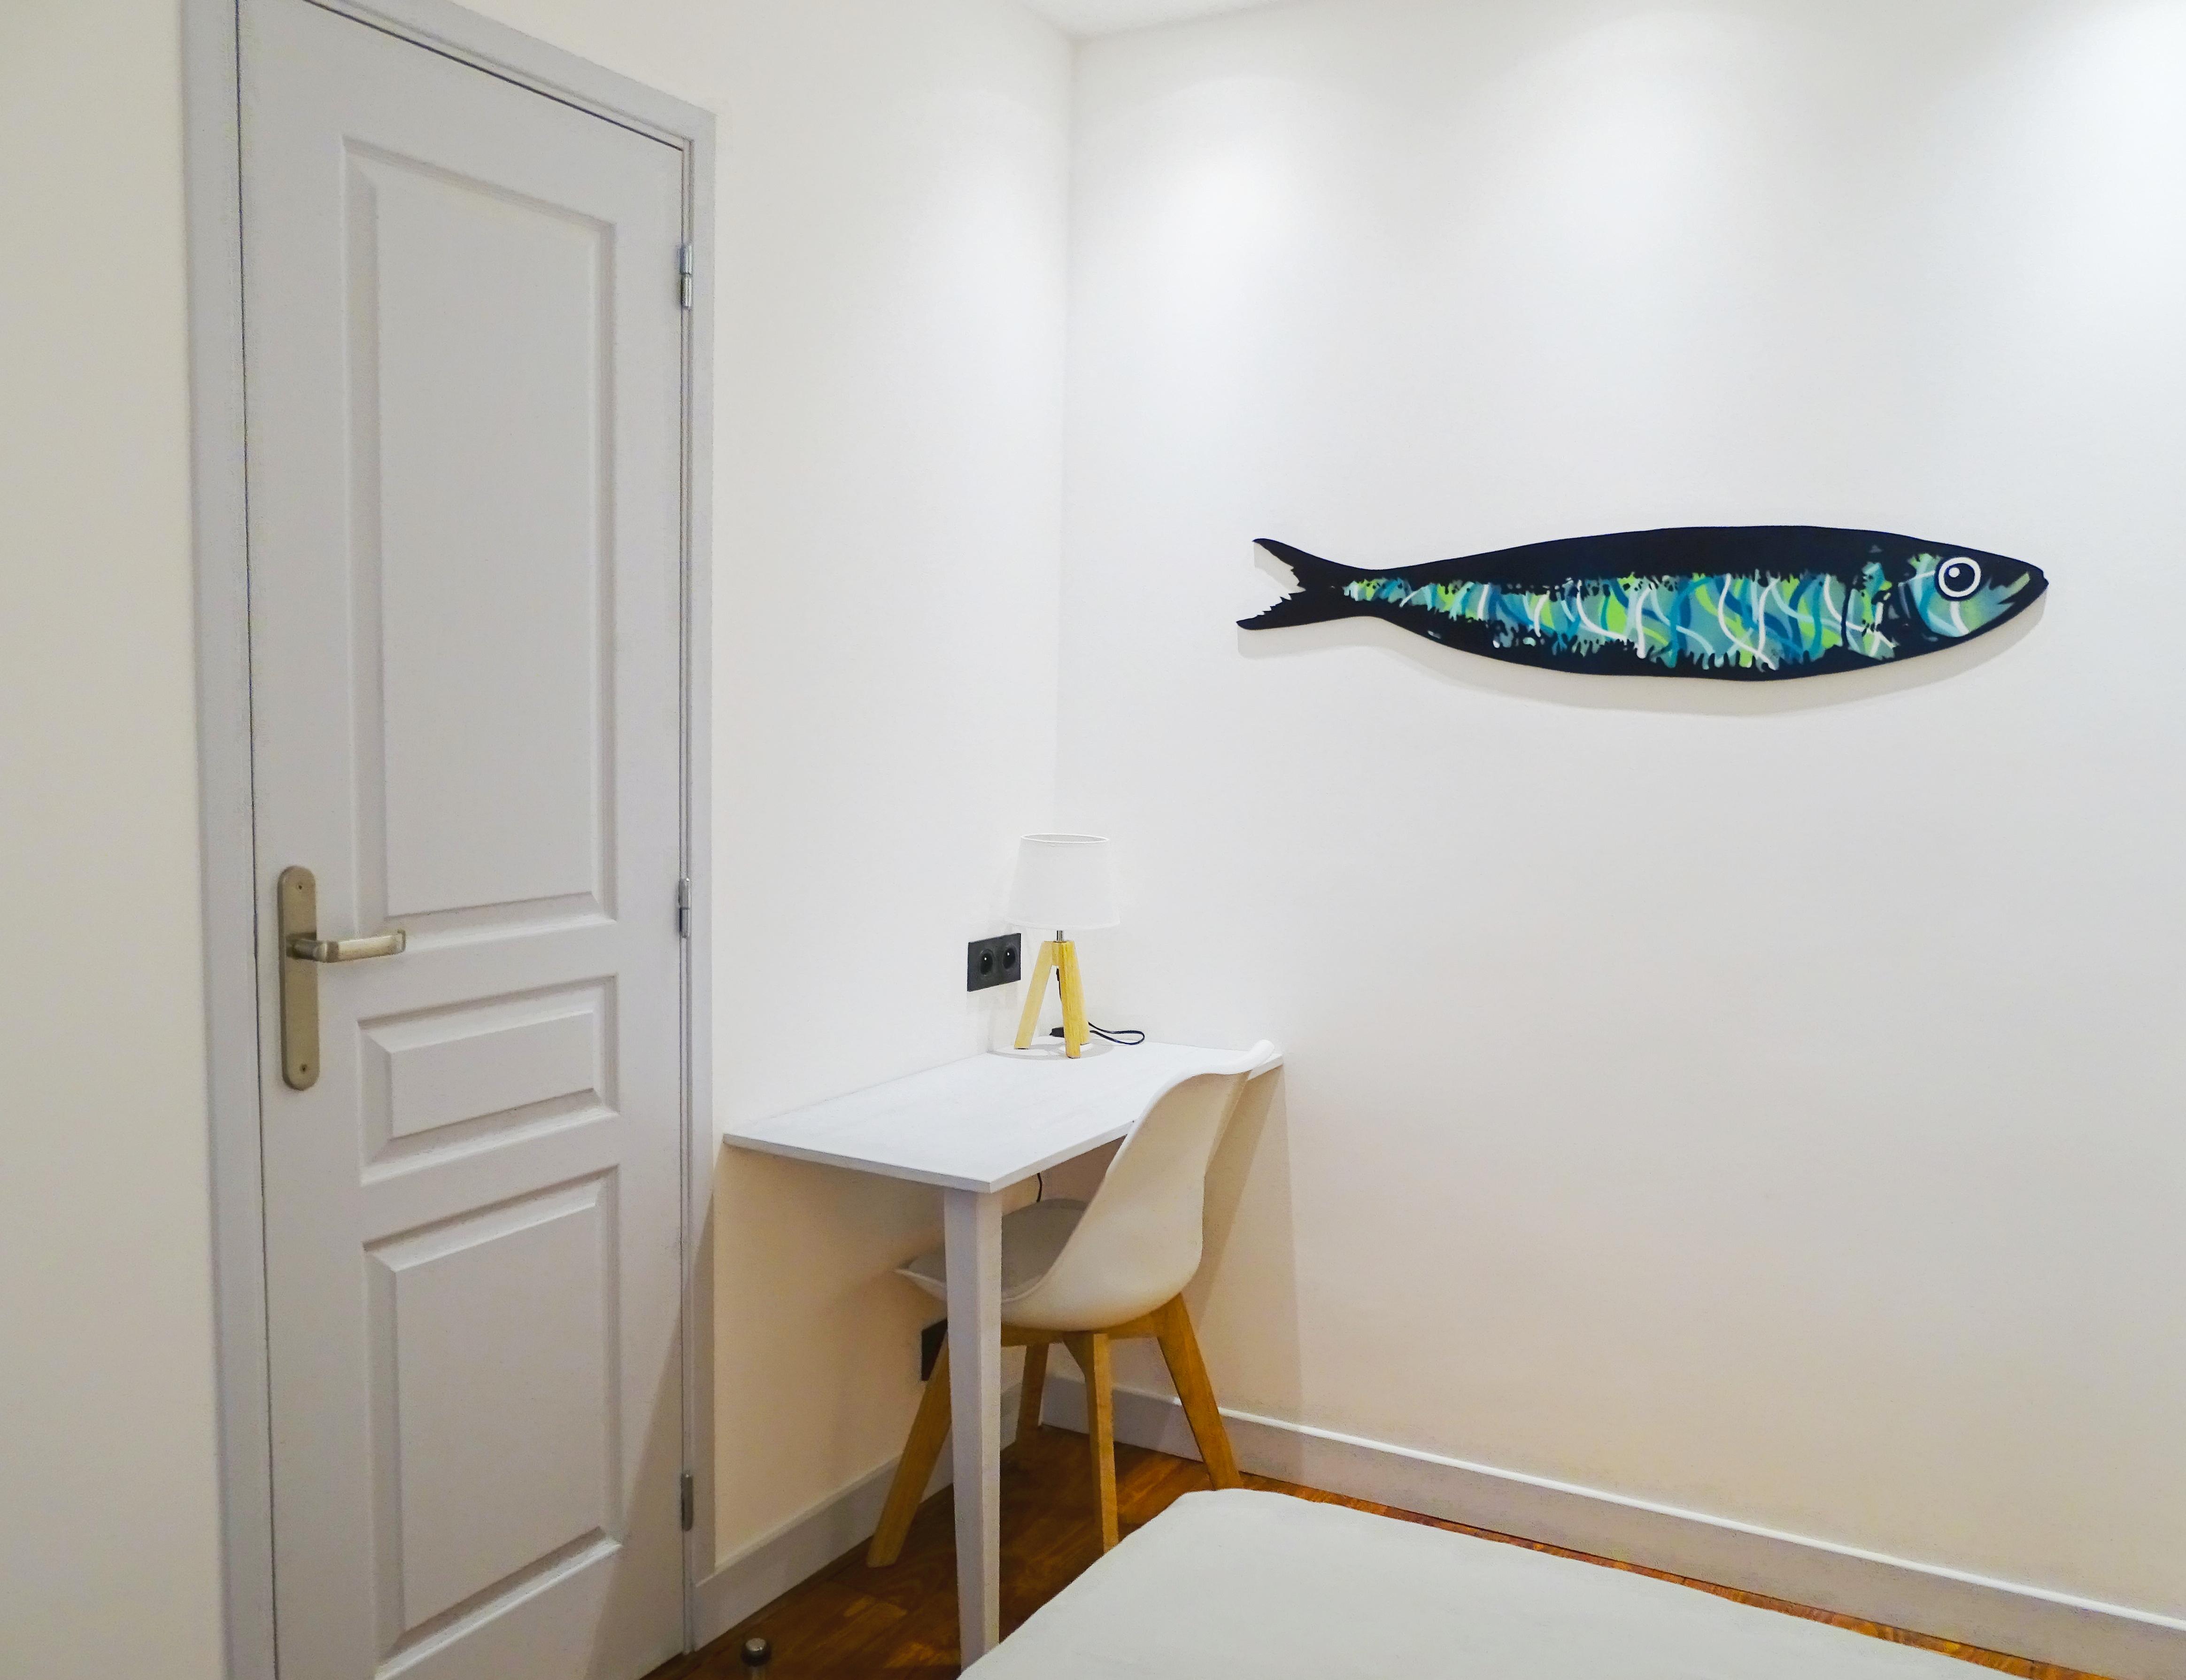 25-chambre barracuda 5